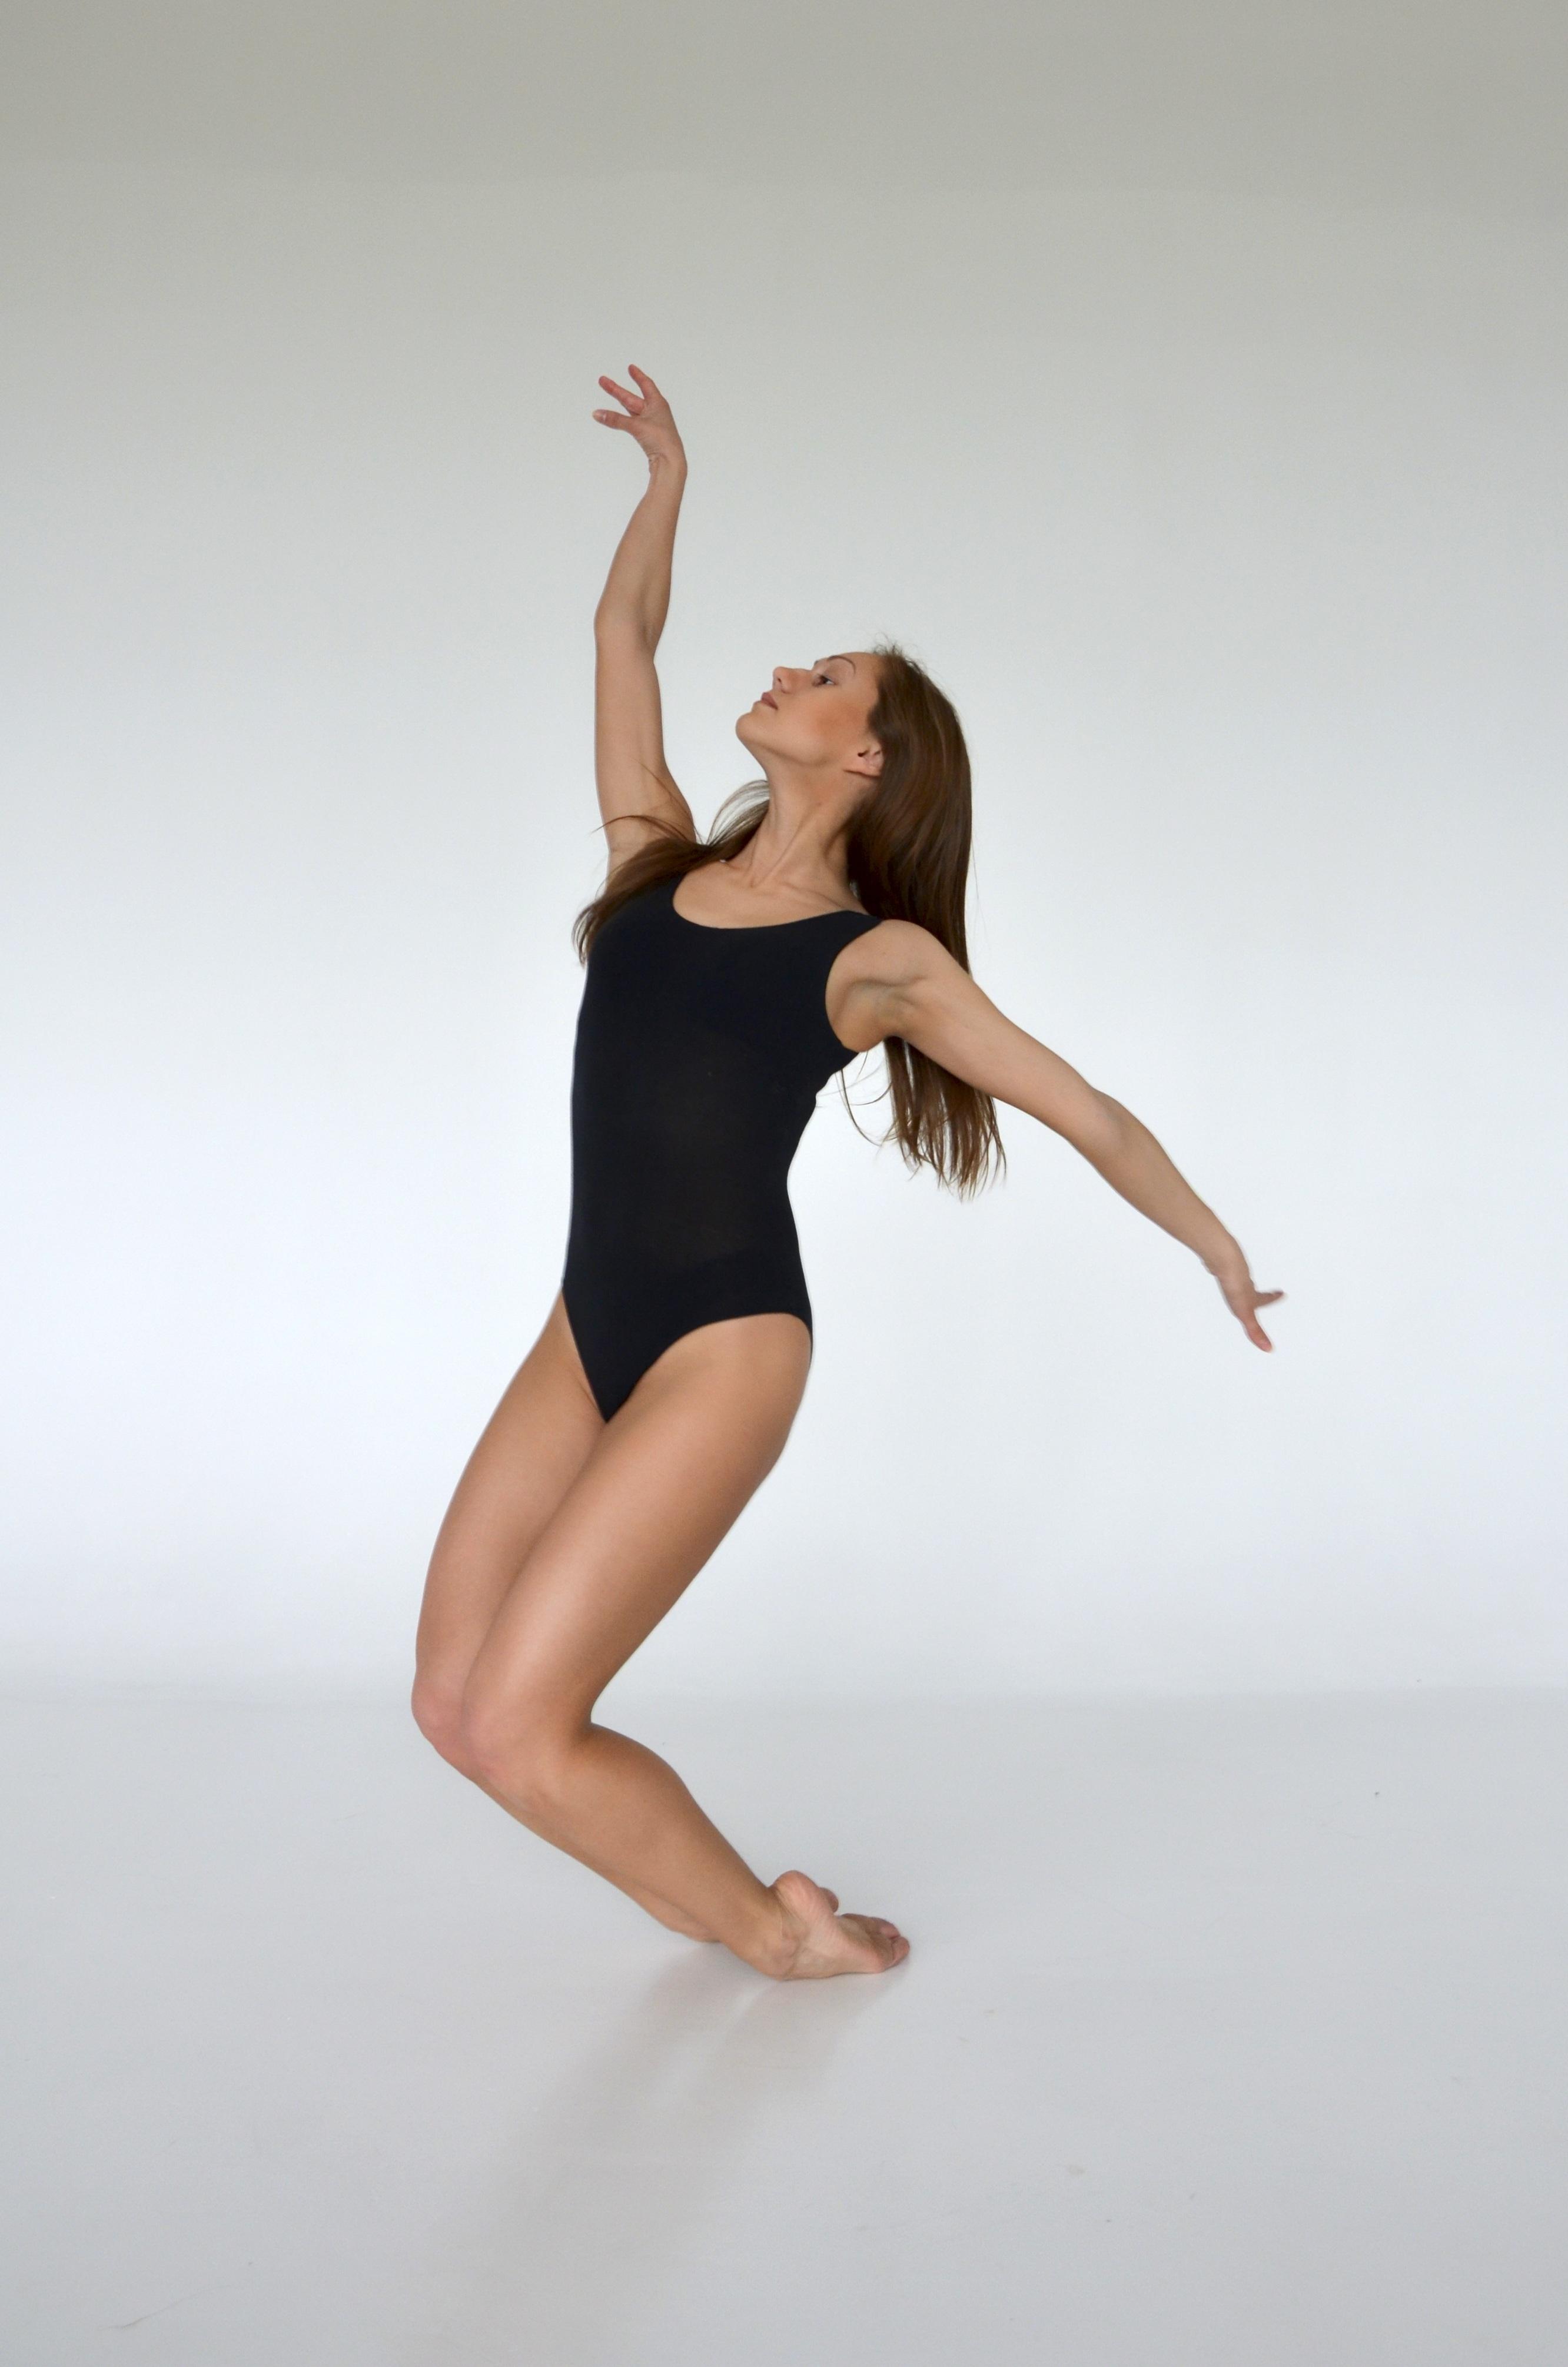 Girl Dance Ballet Sculpture Art Sports Entertainment Gymnastics Performing Arts Aerial Gymnasts Modern Dance Concert Dance on Easy Dance Moves